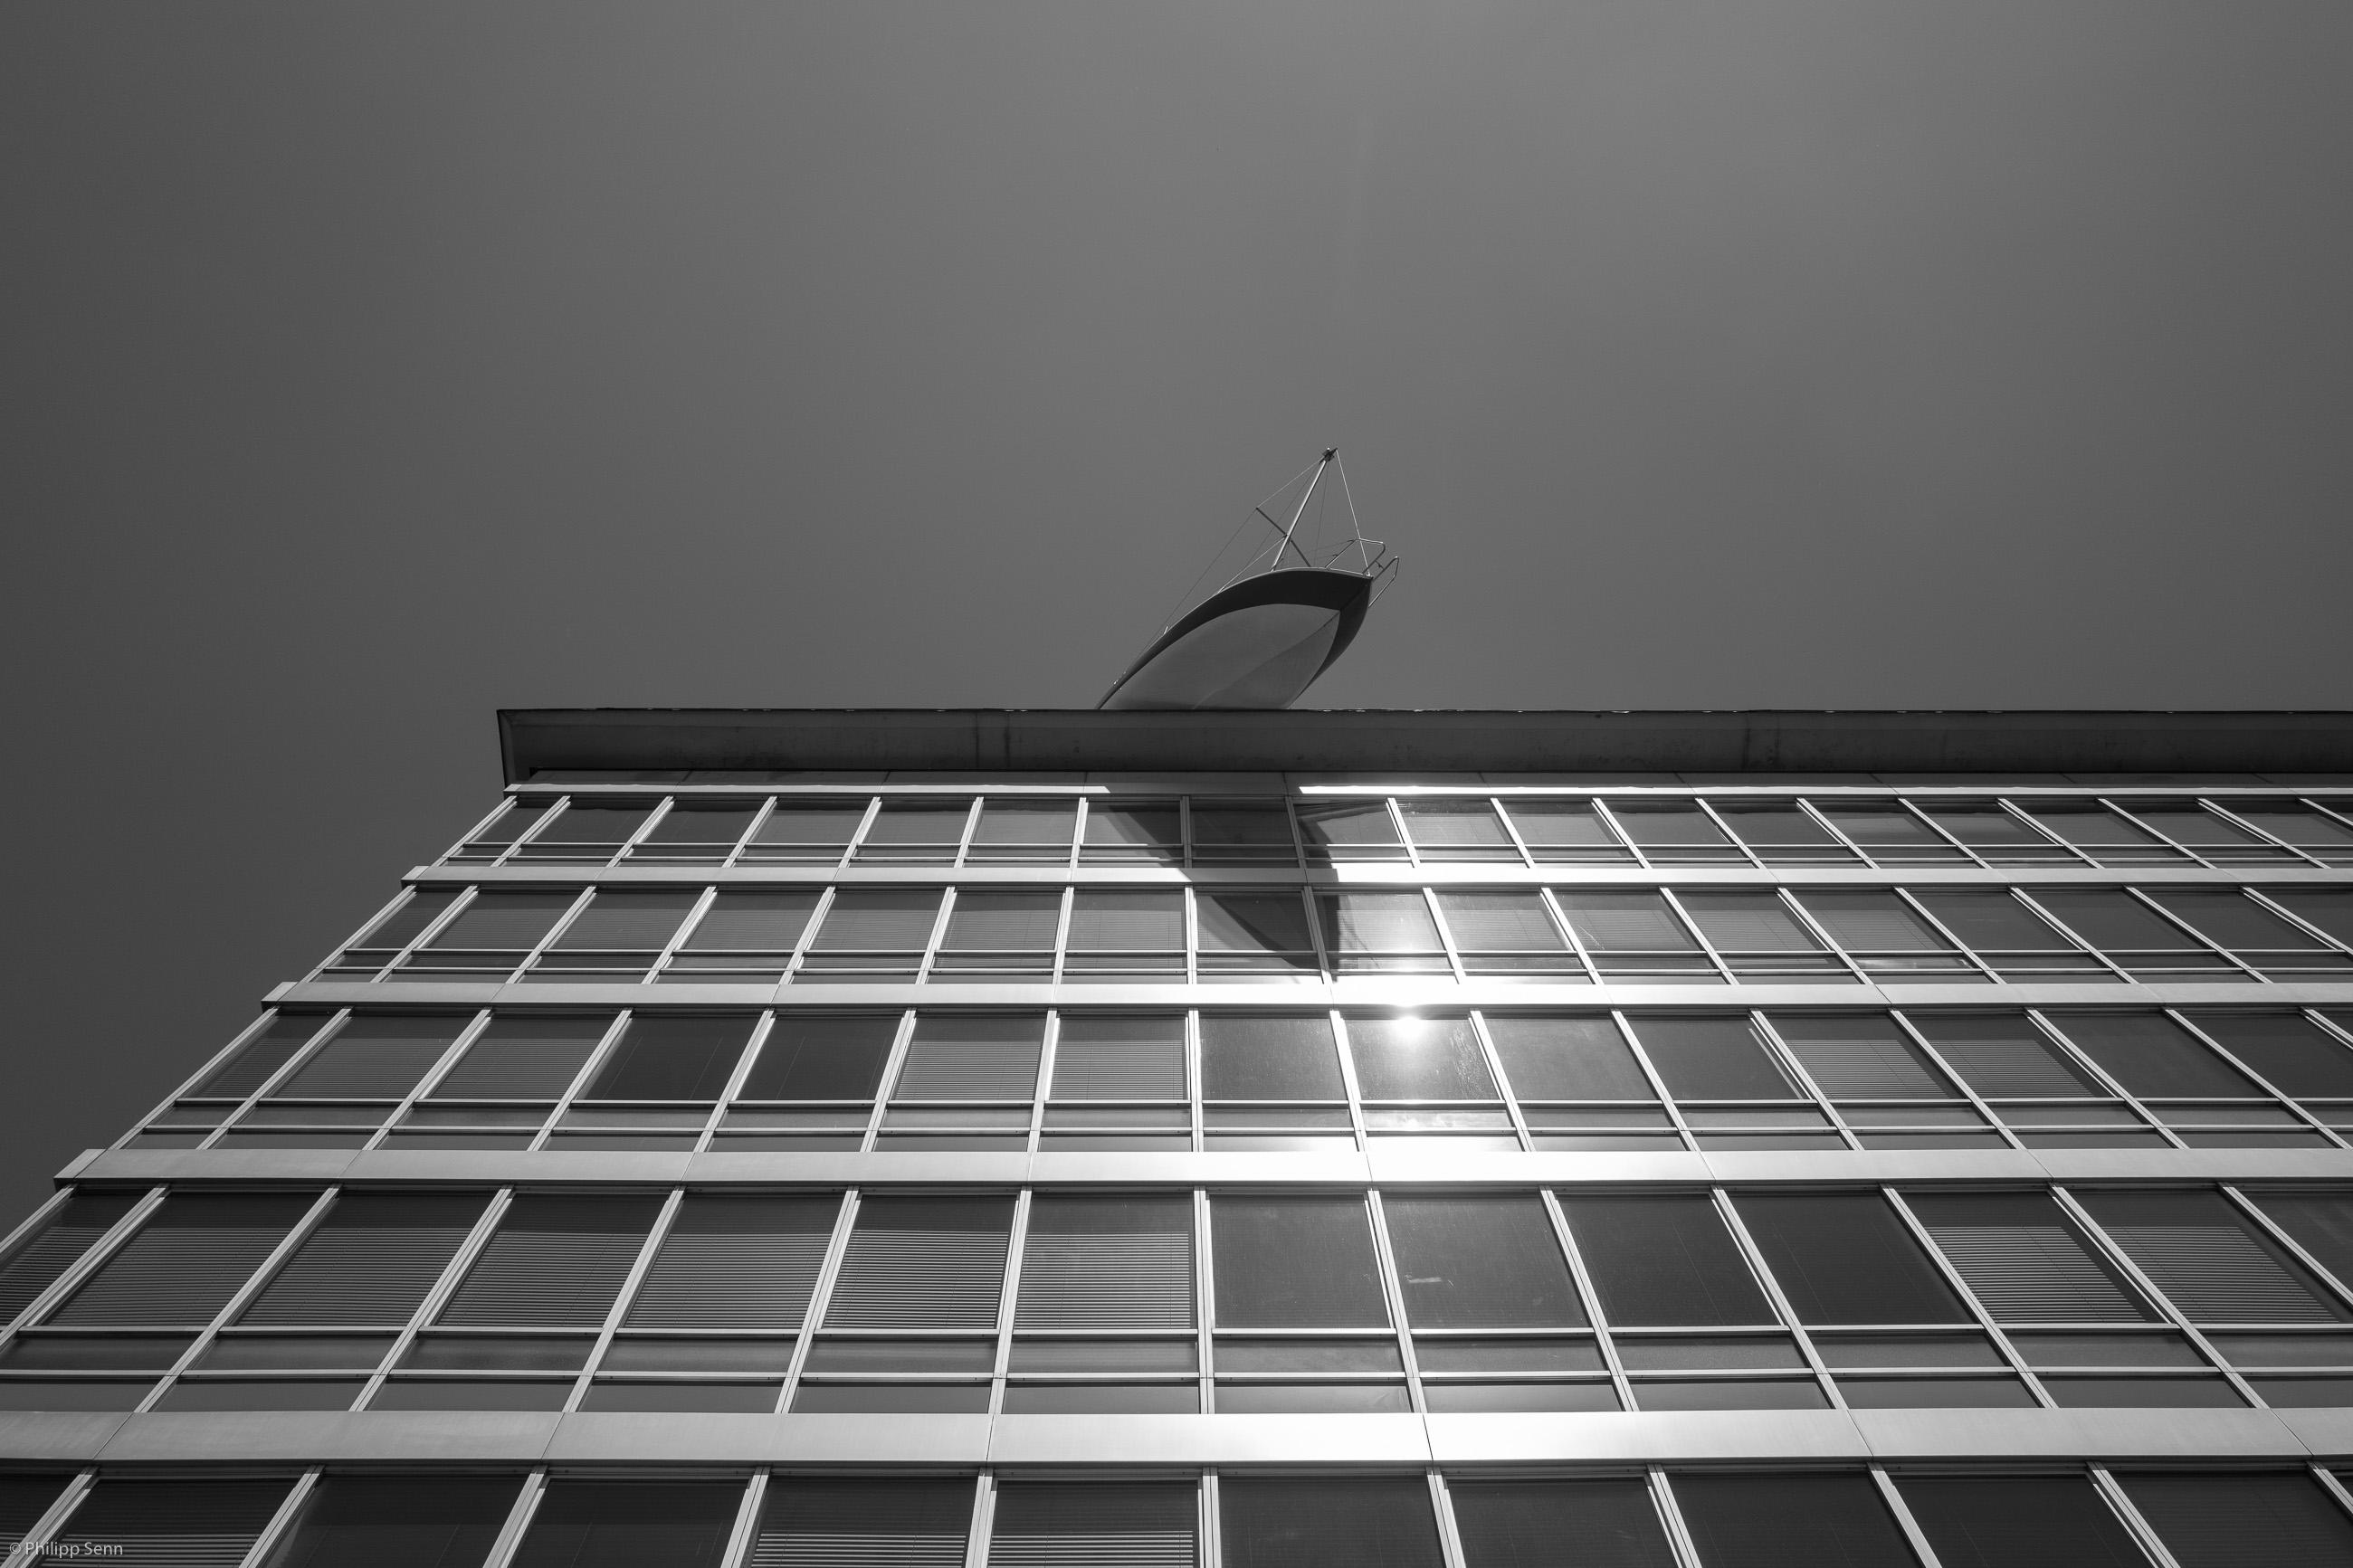 © Philipp Senn. Wien. Segeltörn wäre nun himmlisch.